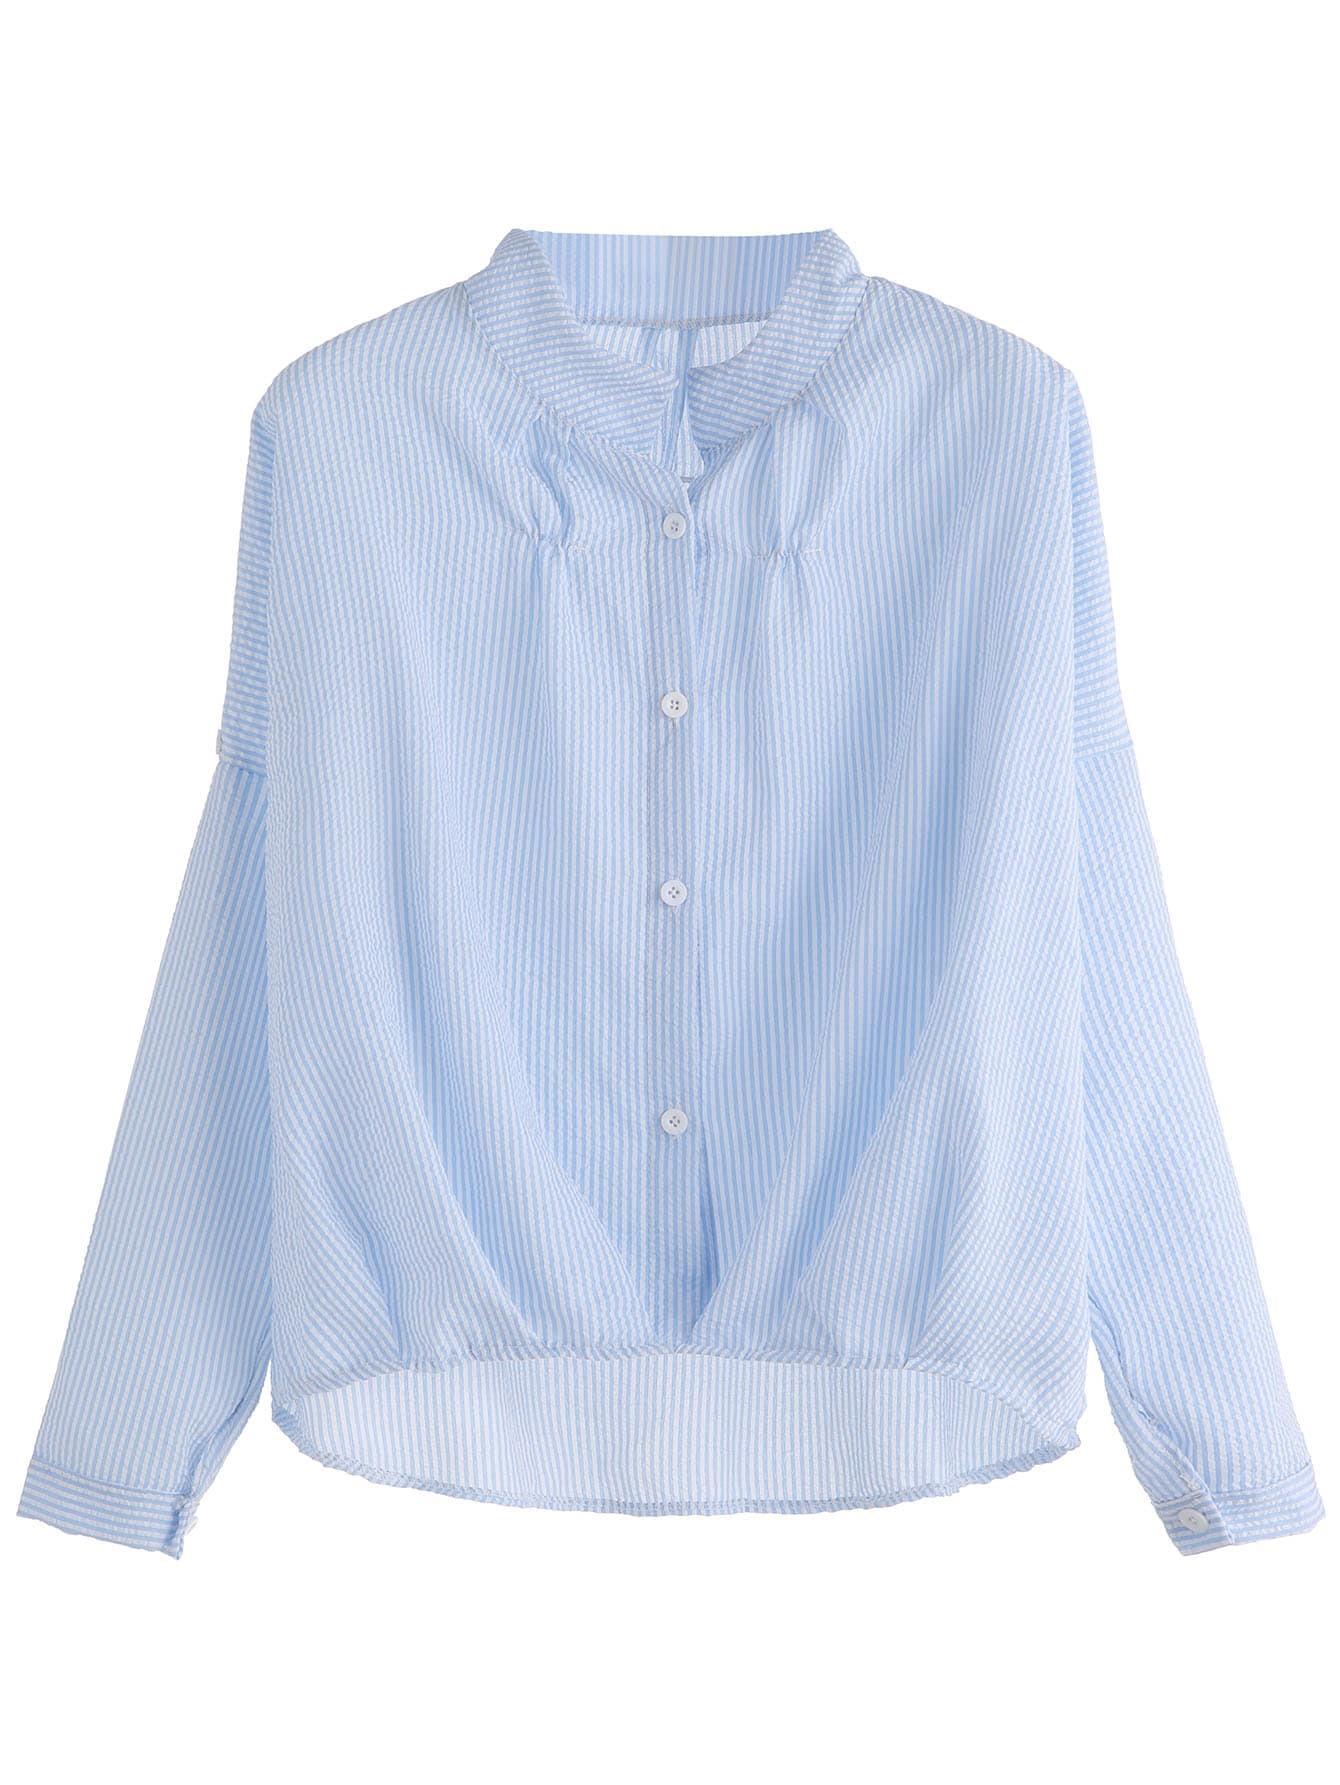 shirt vertical gestreift vorne kurz hinten lang blau. Black Bedroom Furniture Sets. Home Design Ideas